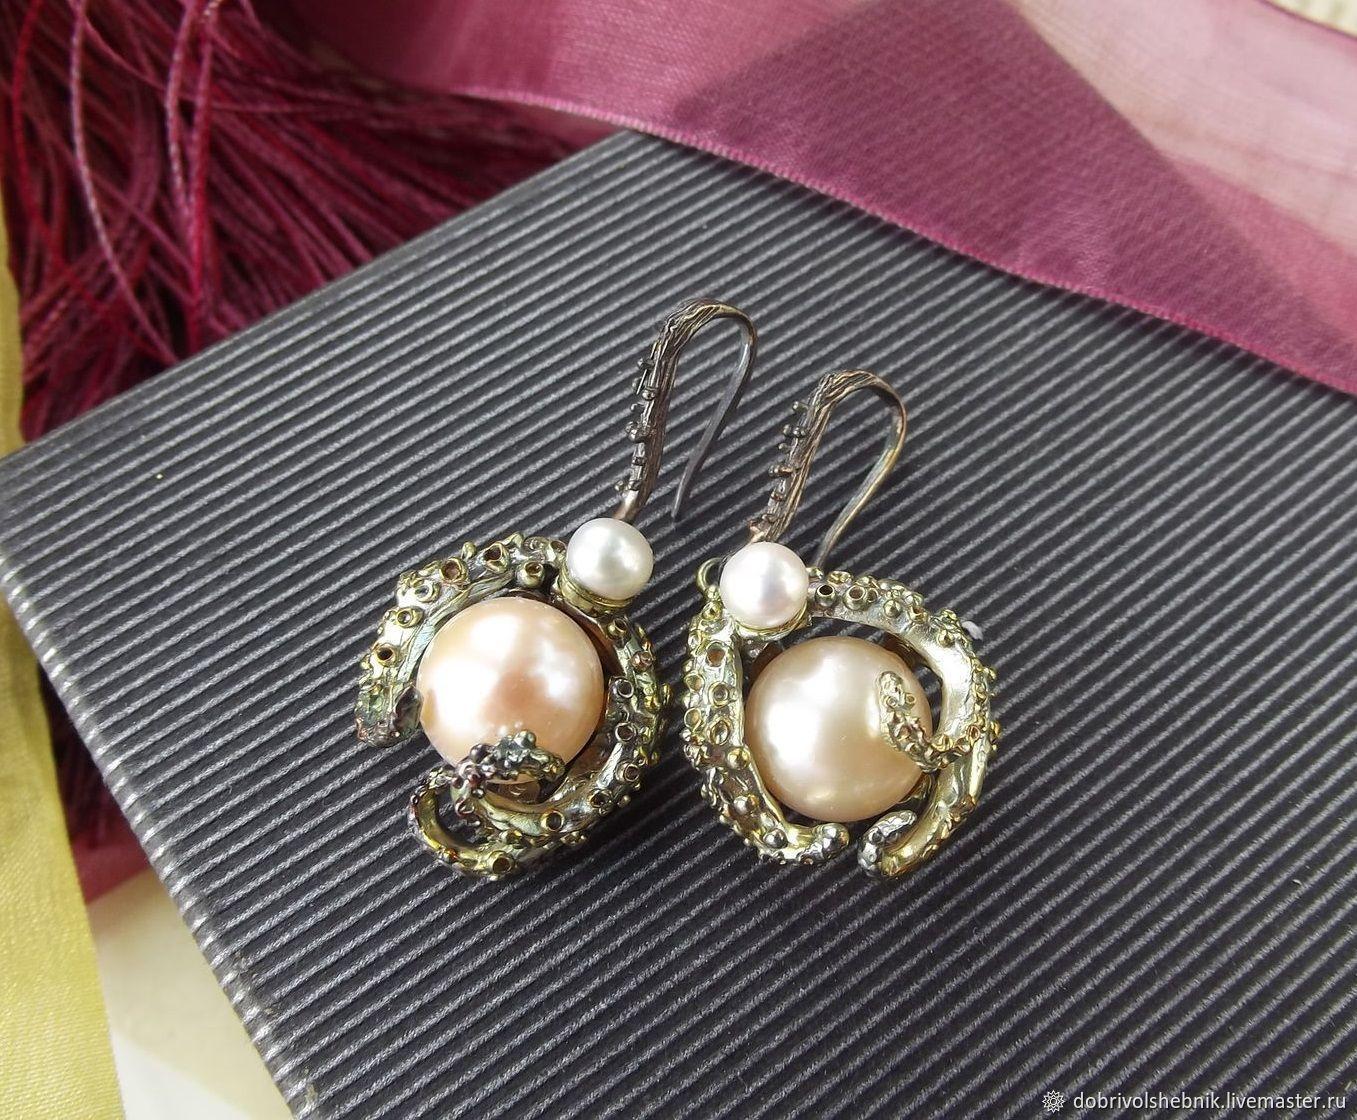 Earrings 'On distant shores' with pearls, Earrings, Novaya Usman,  Фото №1